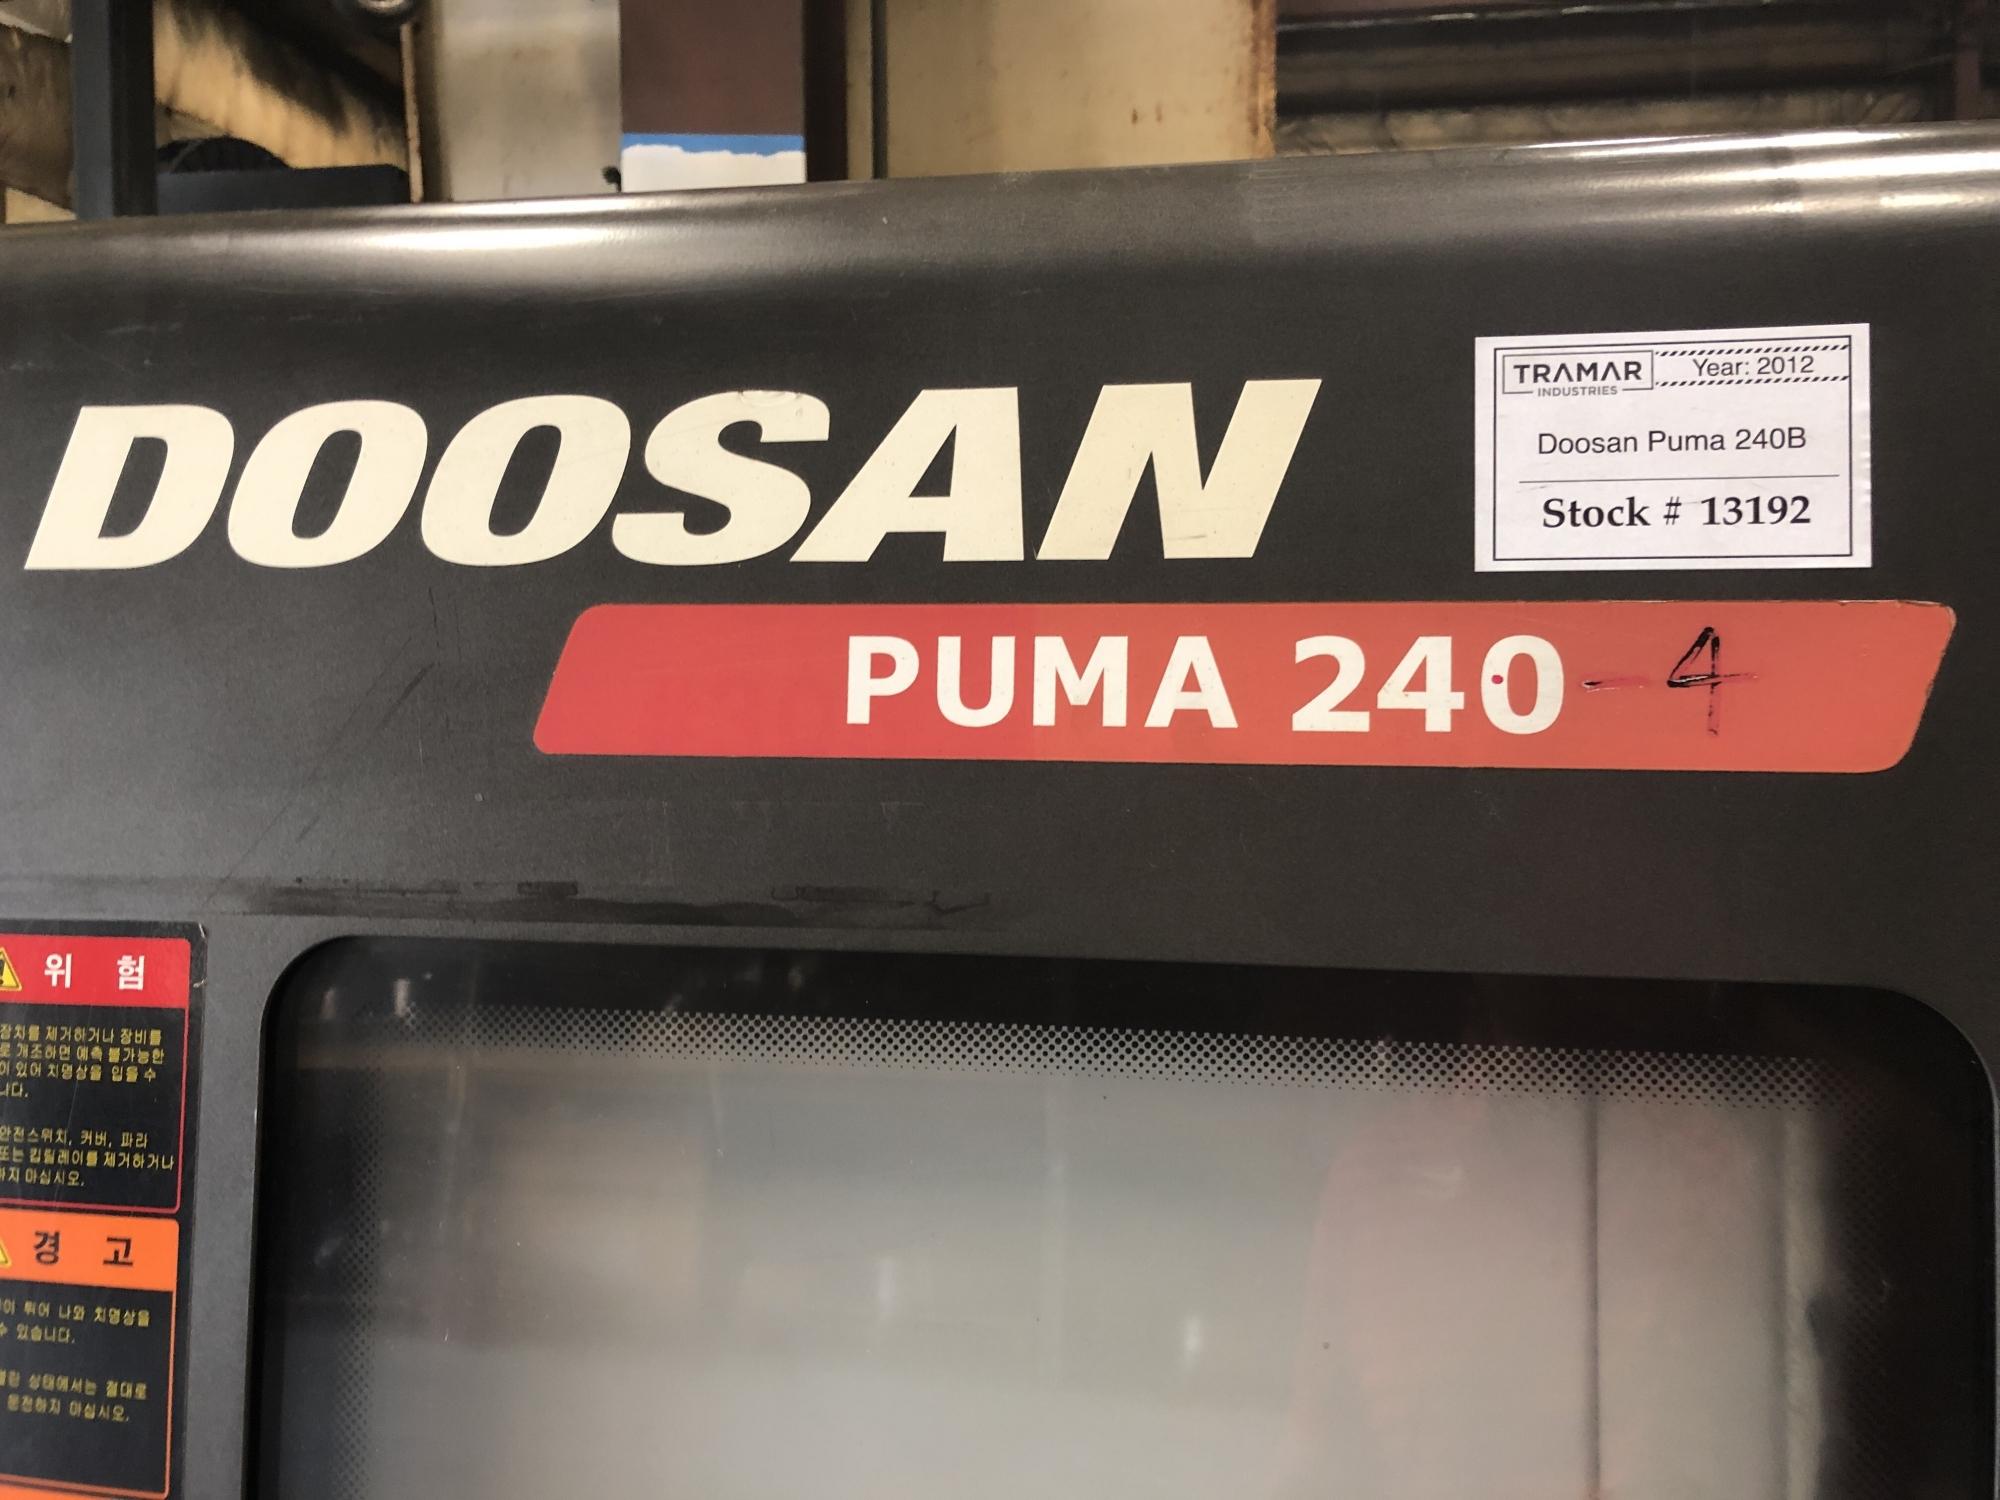 2012 Doosan Puma 240B - CNC Horizontal Lathe